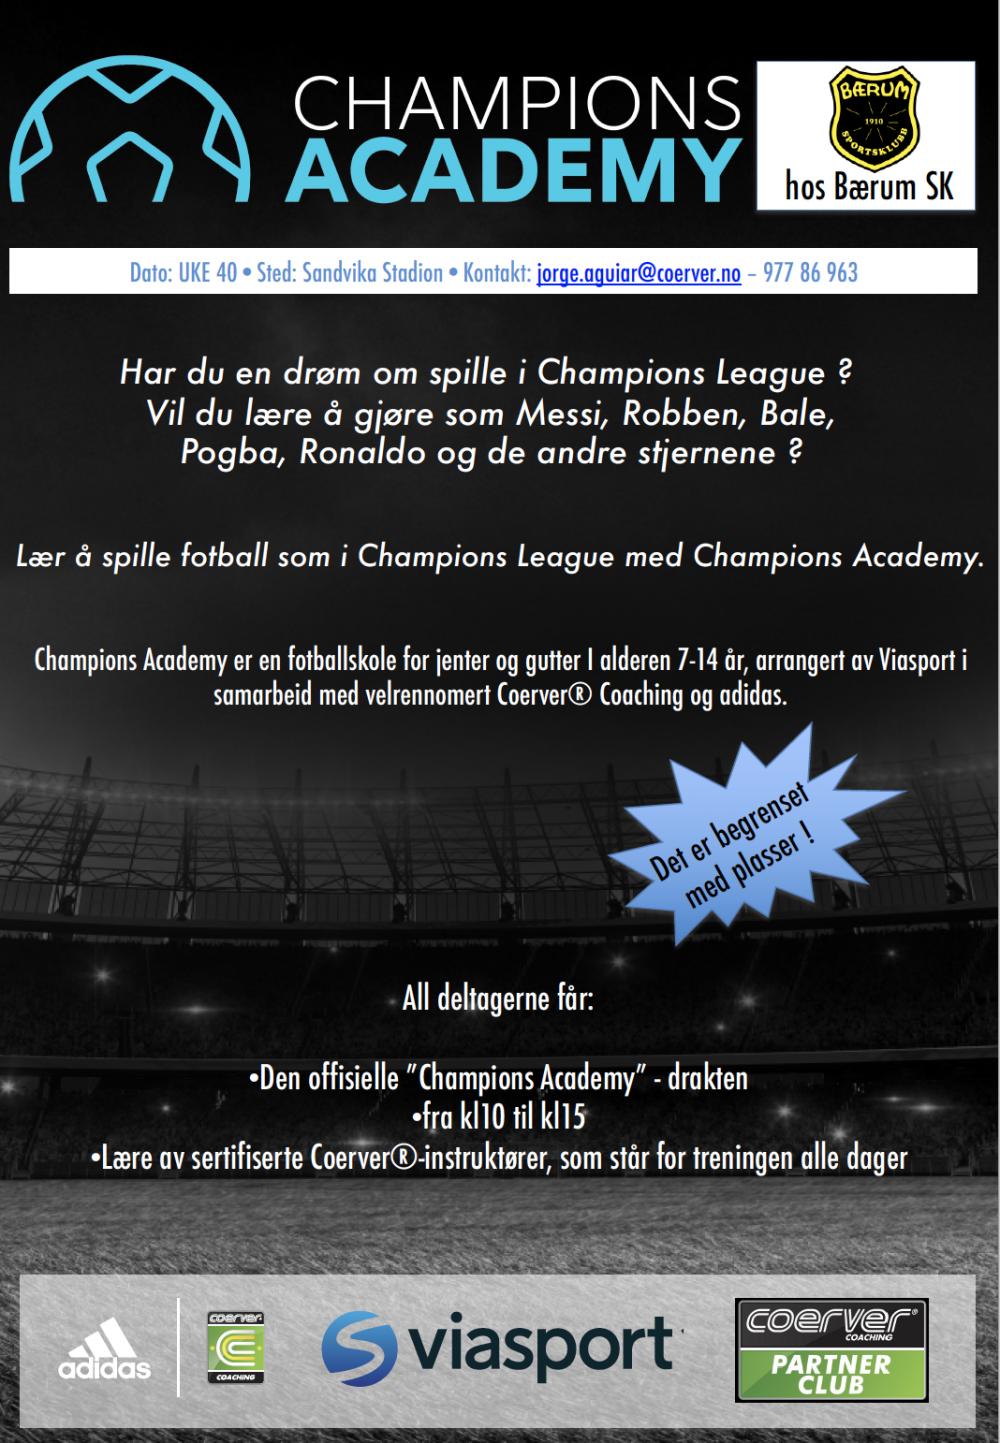 Champions Academy hos Bærum SK  2020